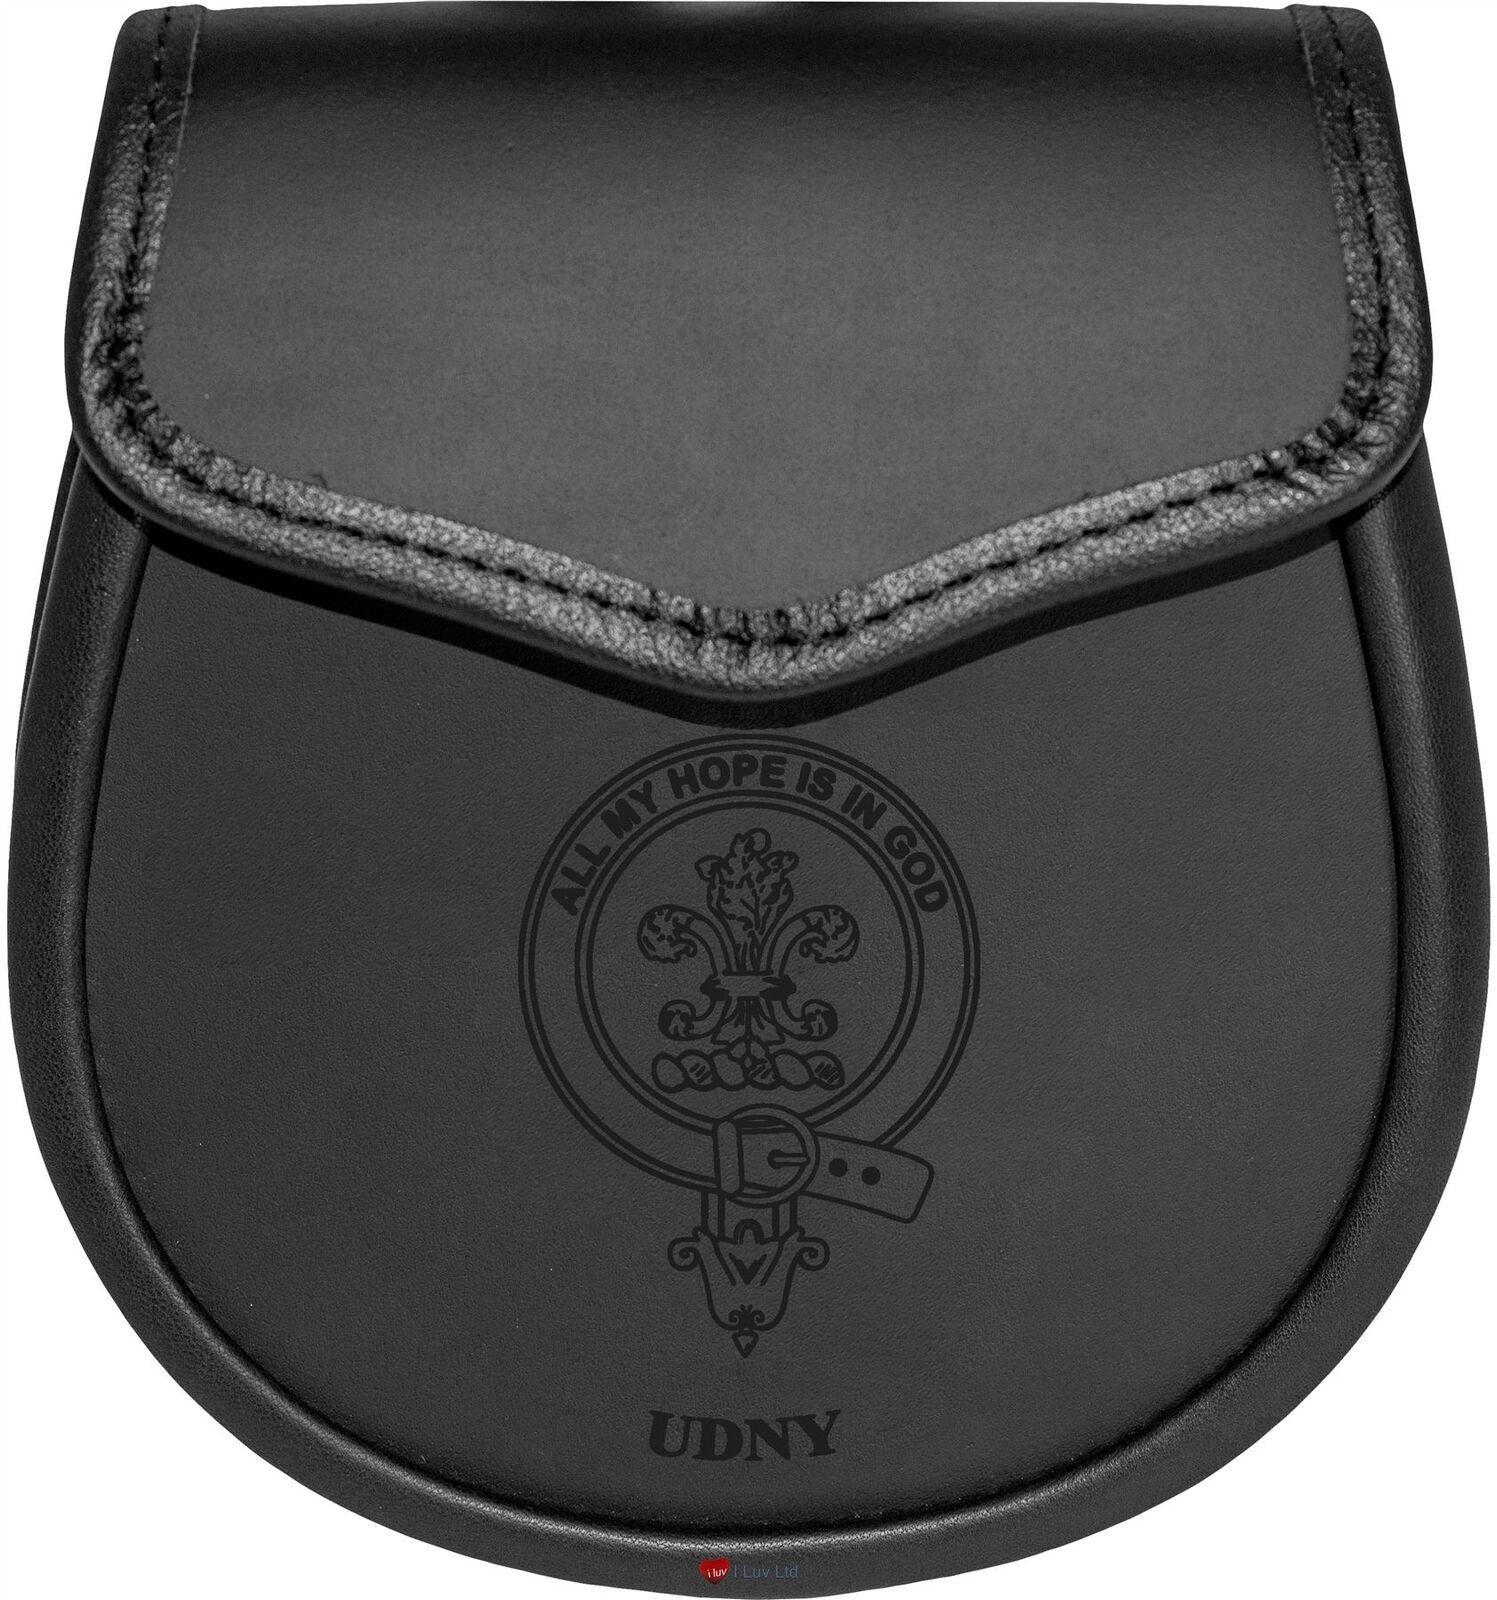 Udny Leather Day Sporran Scottish Clan Crest